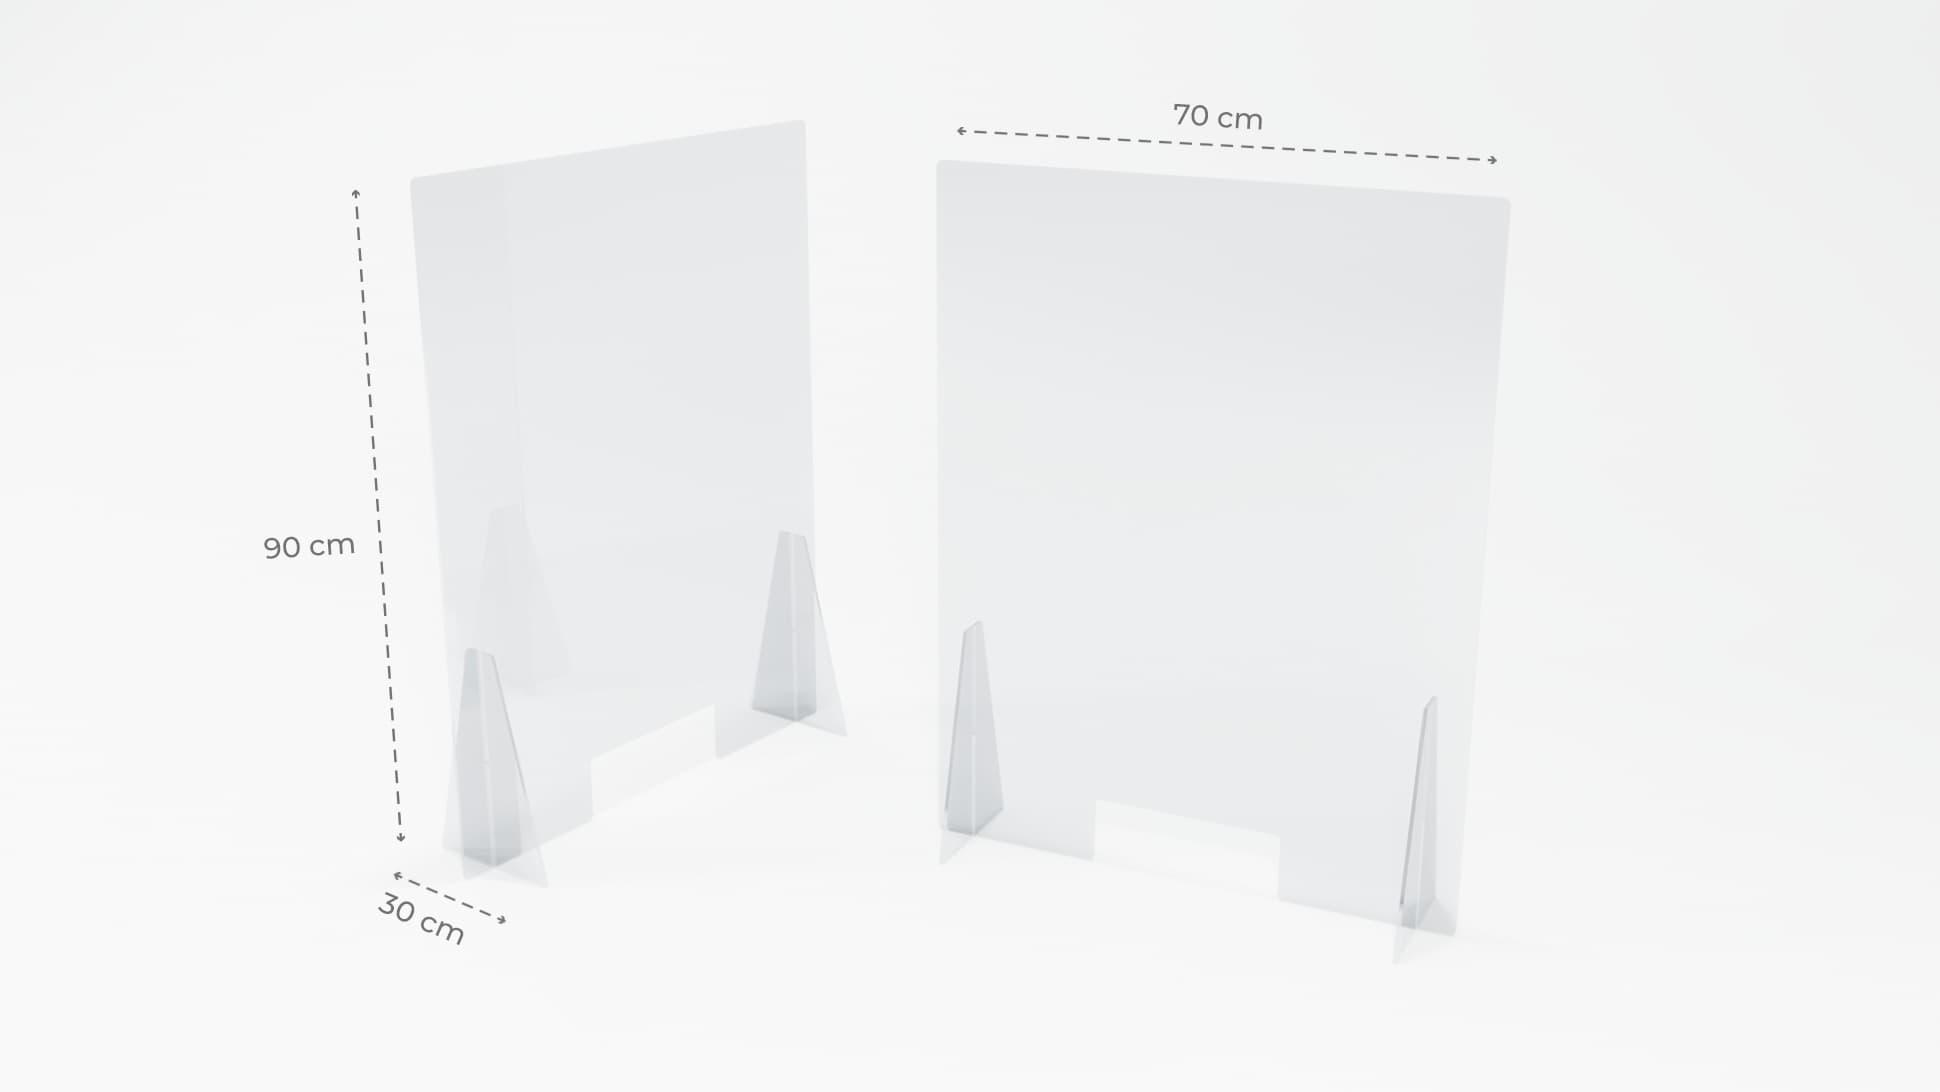 Separè parafiato in plastiglass trasparente 5 mm medio | tictac.it